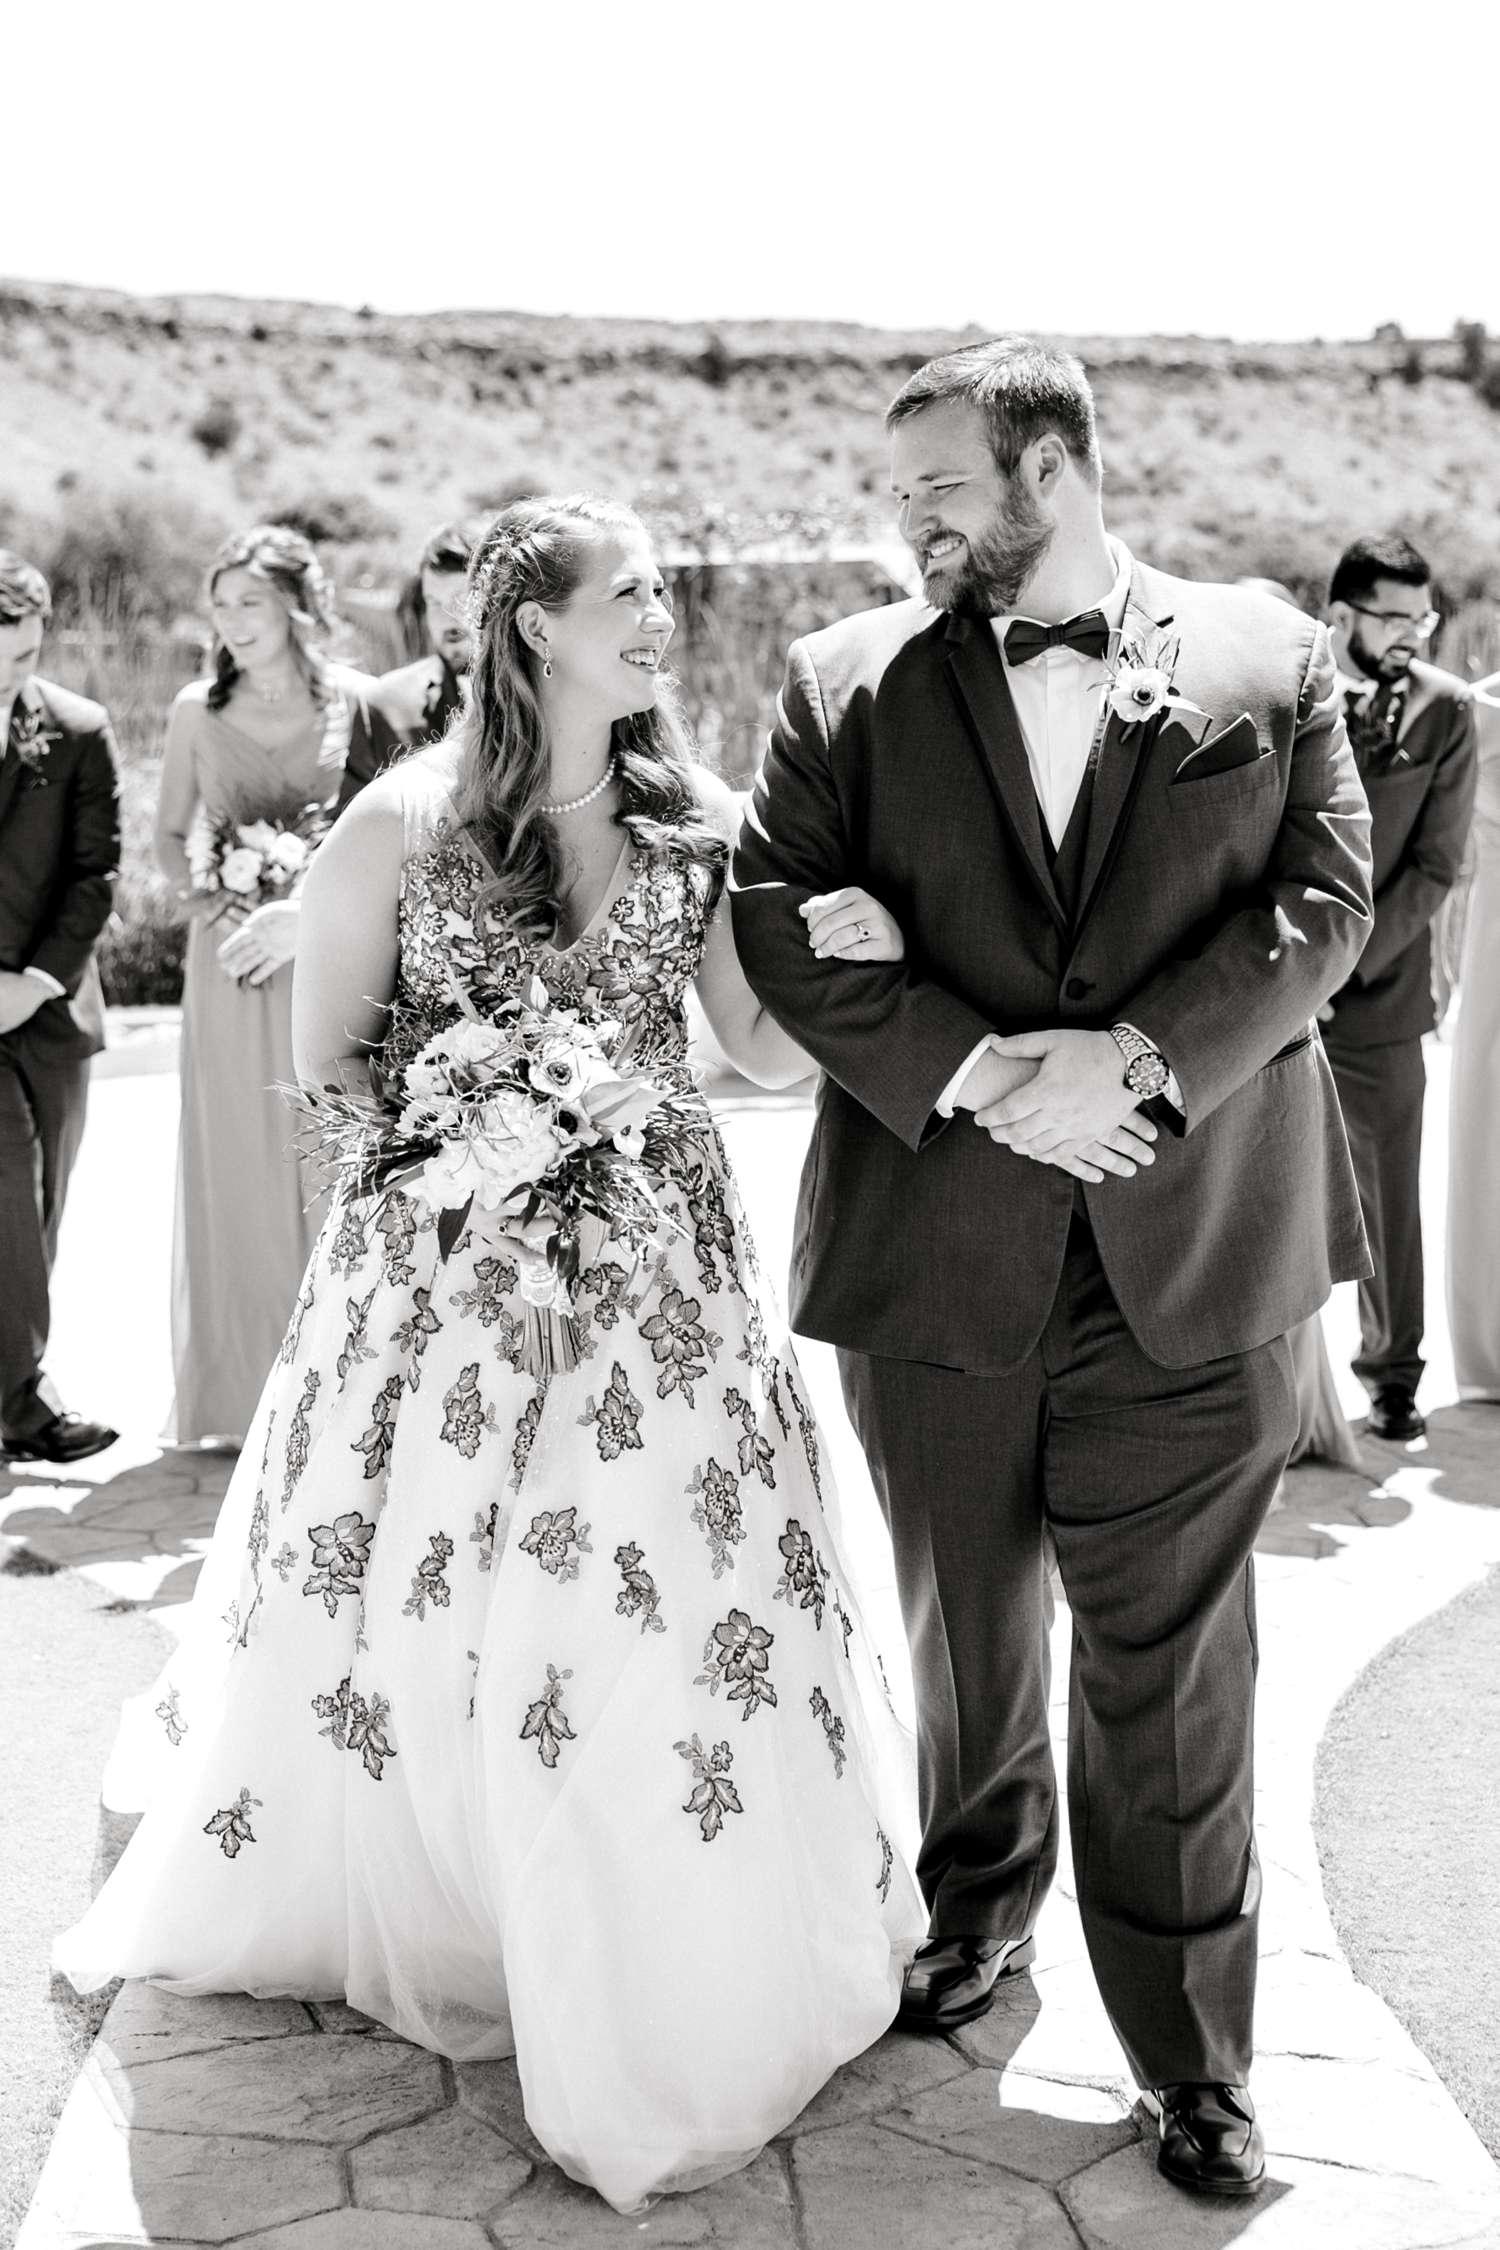 TY+NATHAN+HALLIER+ALLEEJ+WEDDING+PHOTOGRAPHER+RANSOM+CANYON_0044.jpg